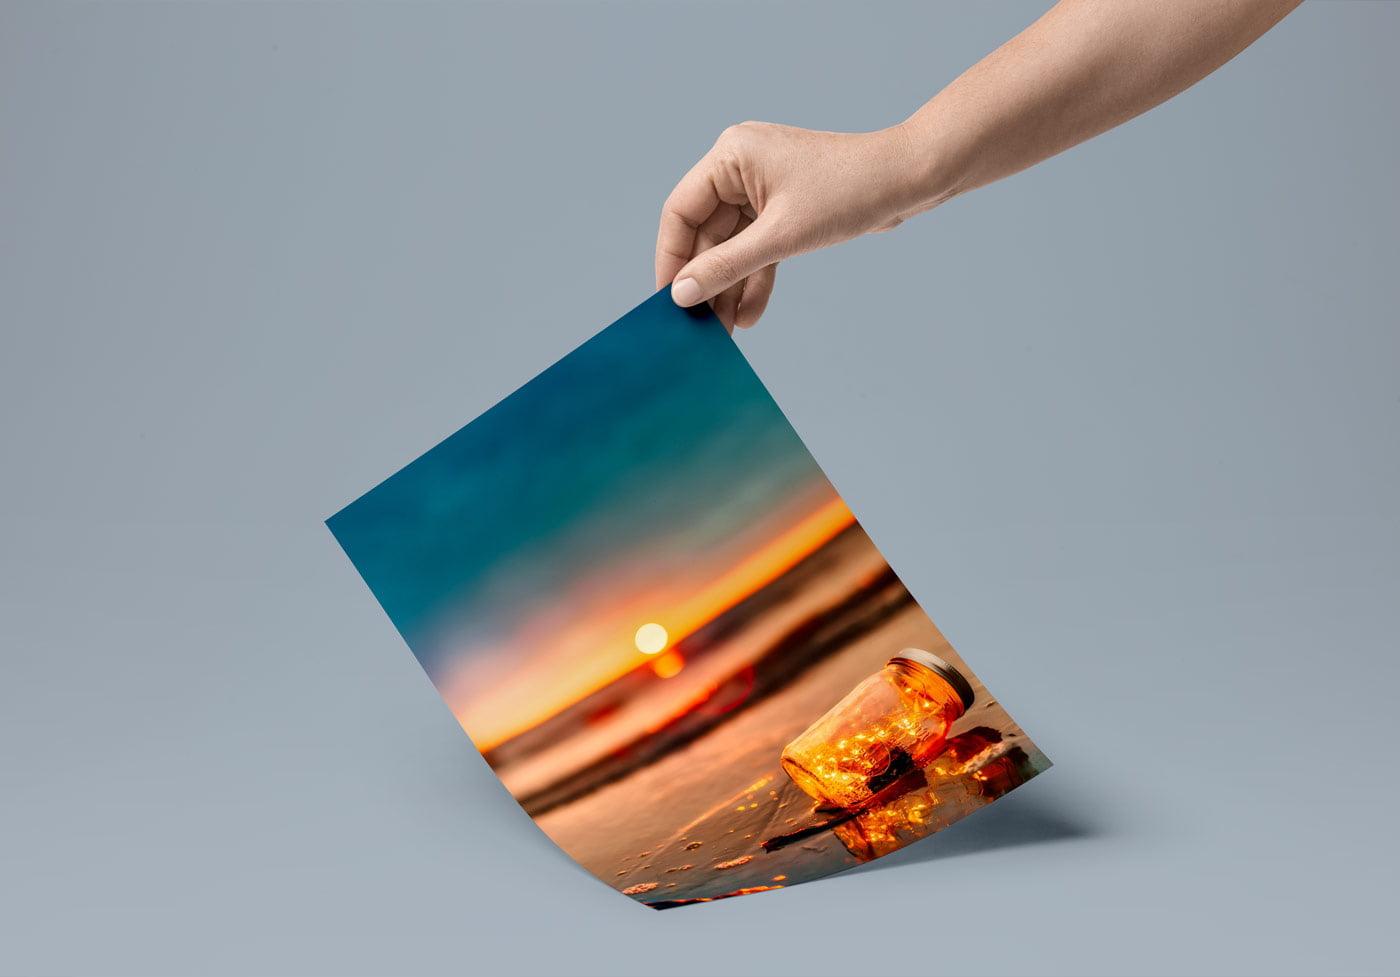 sunse photography 2 - آموزش عکاسی از غروب آفتاب